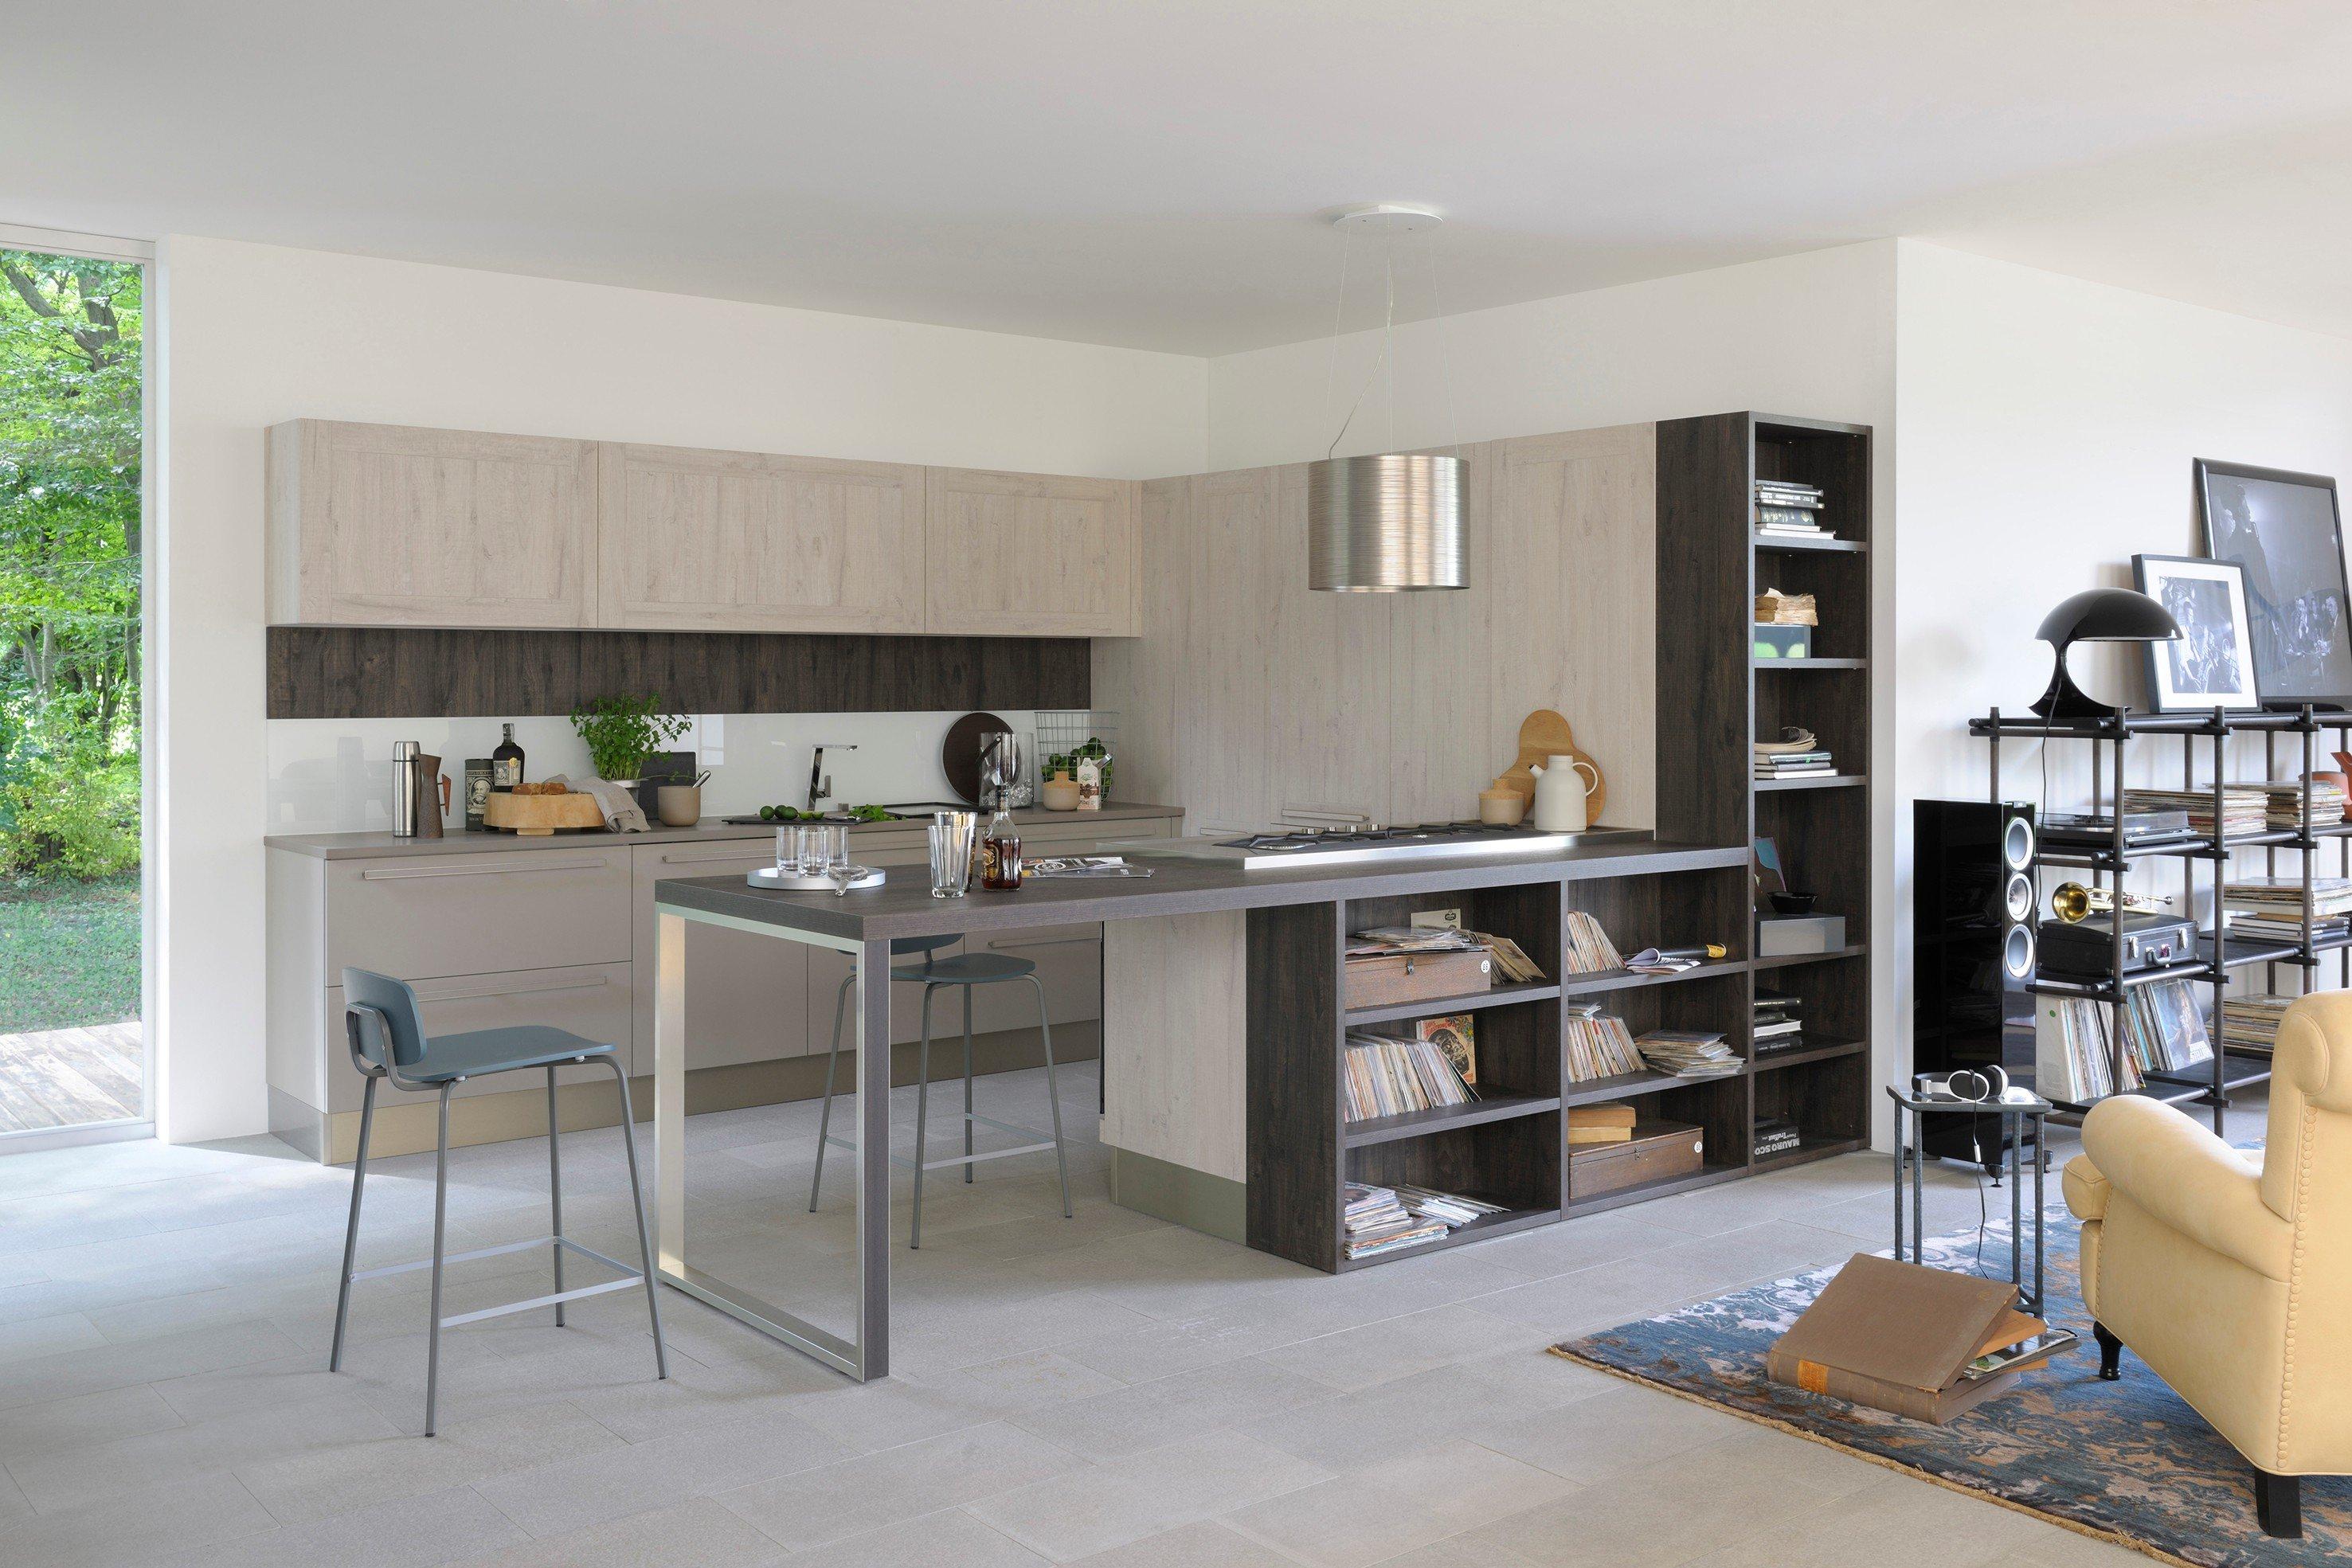 Emejing Cucine Per Piccoli Spazi Images - Ideas & Design 2017 ...